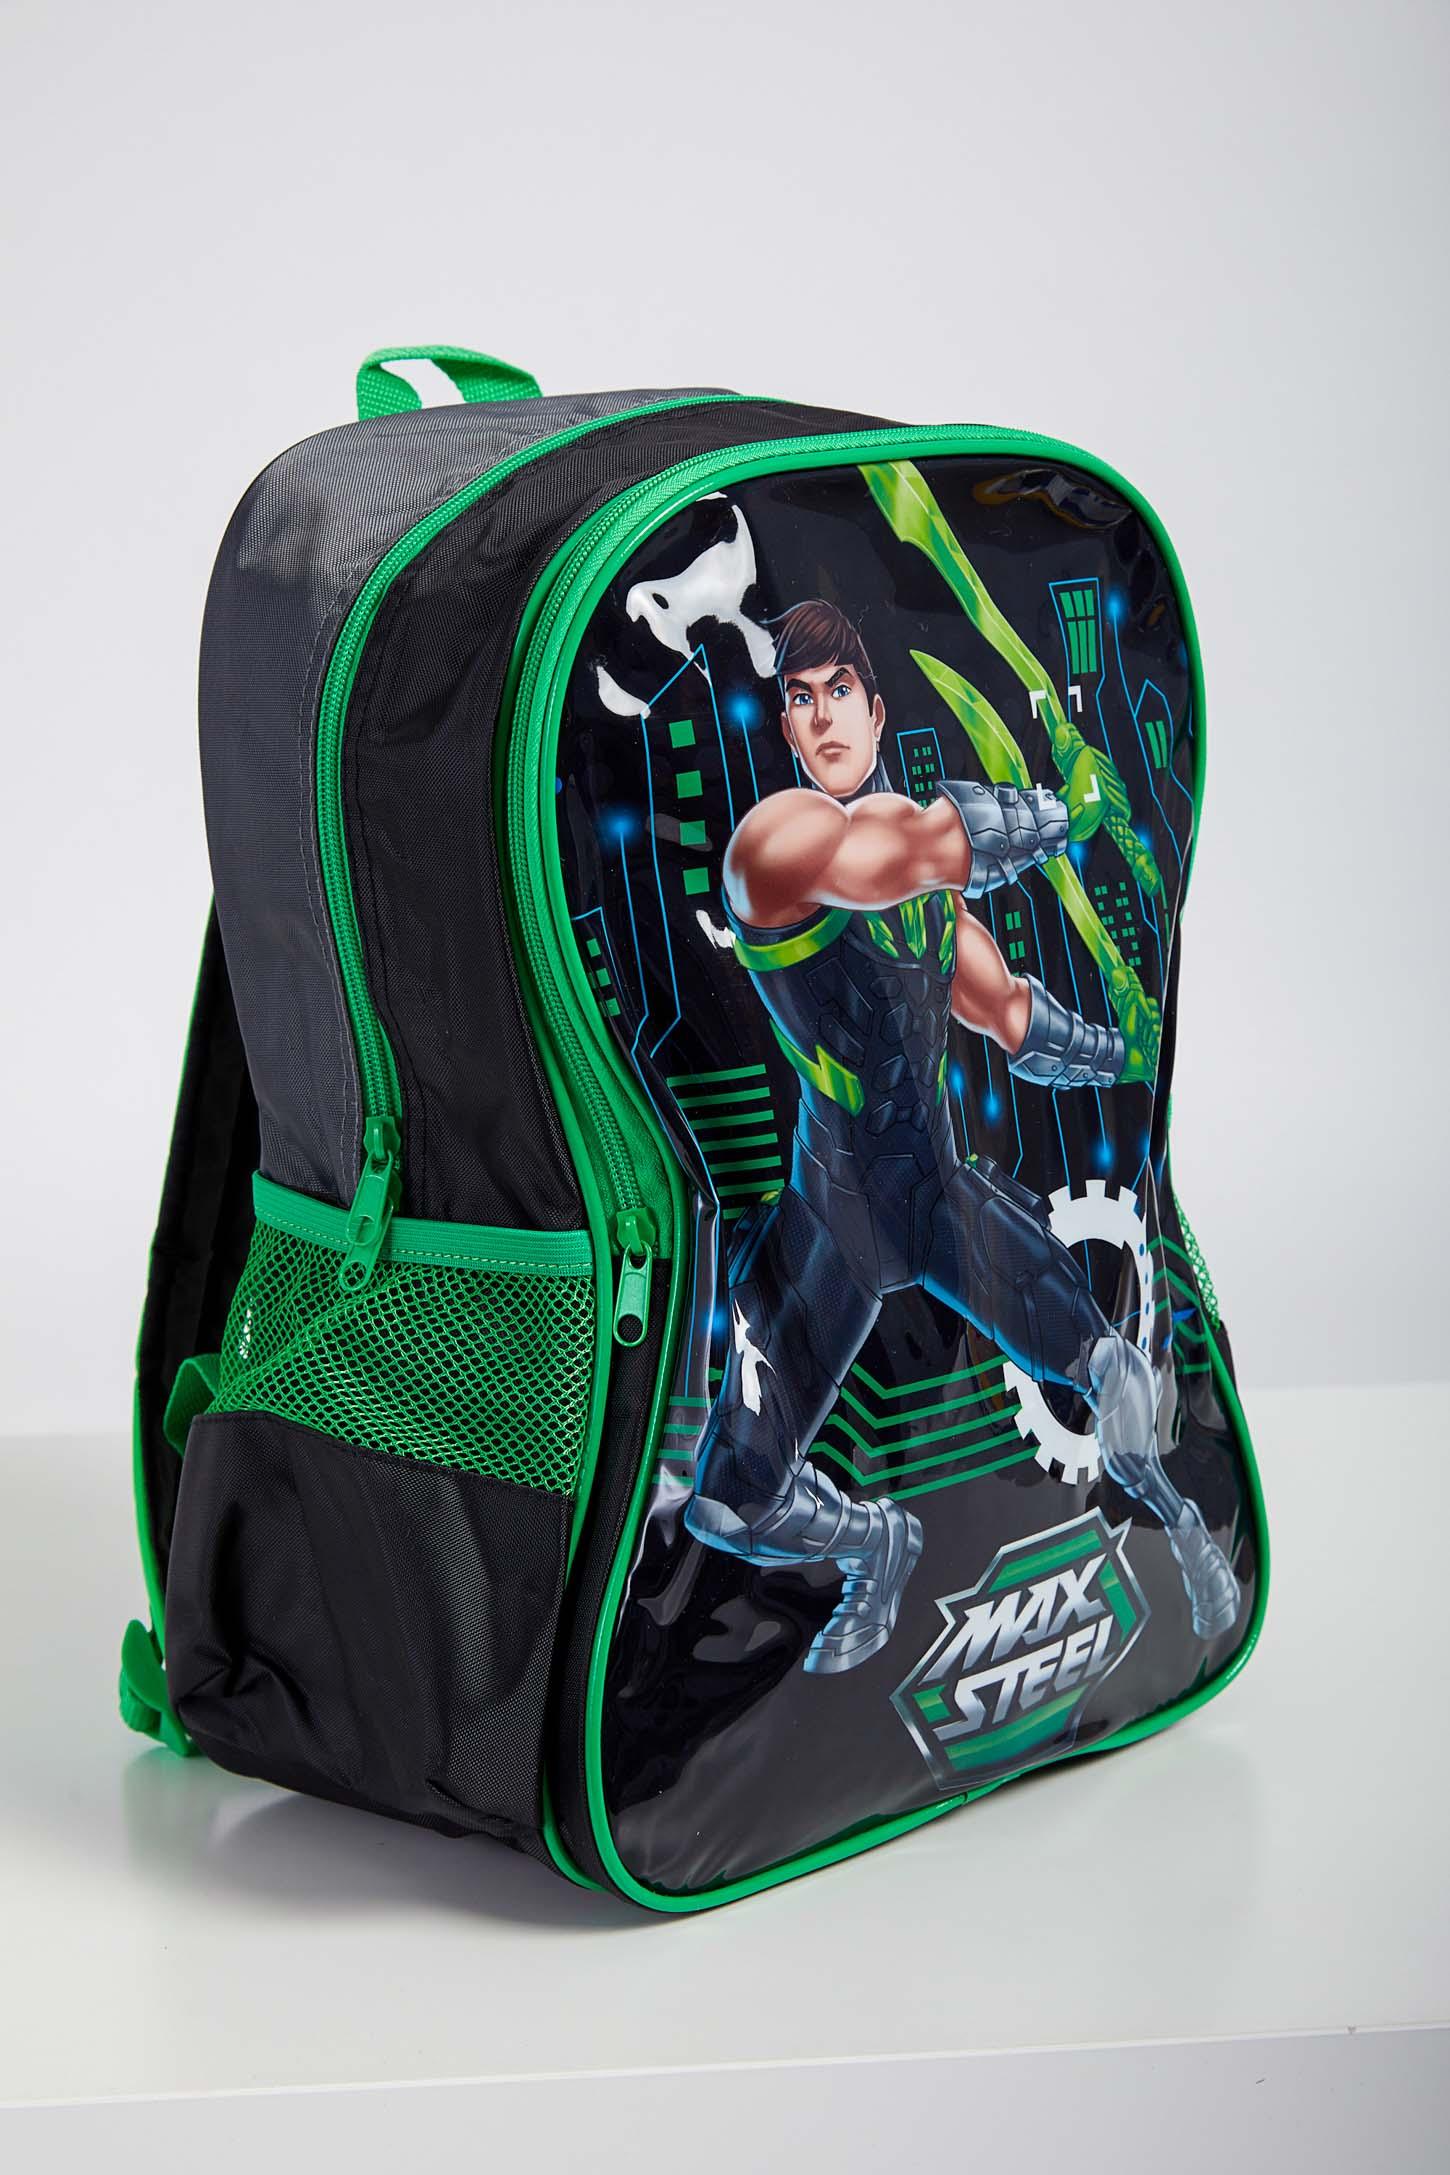 Mochila-Escolar-Infantil-Menino-Max-Steel-Luxcel-Verde